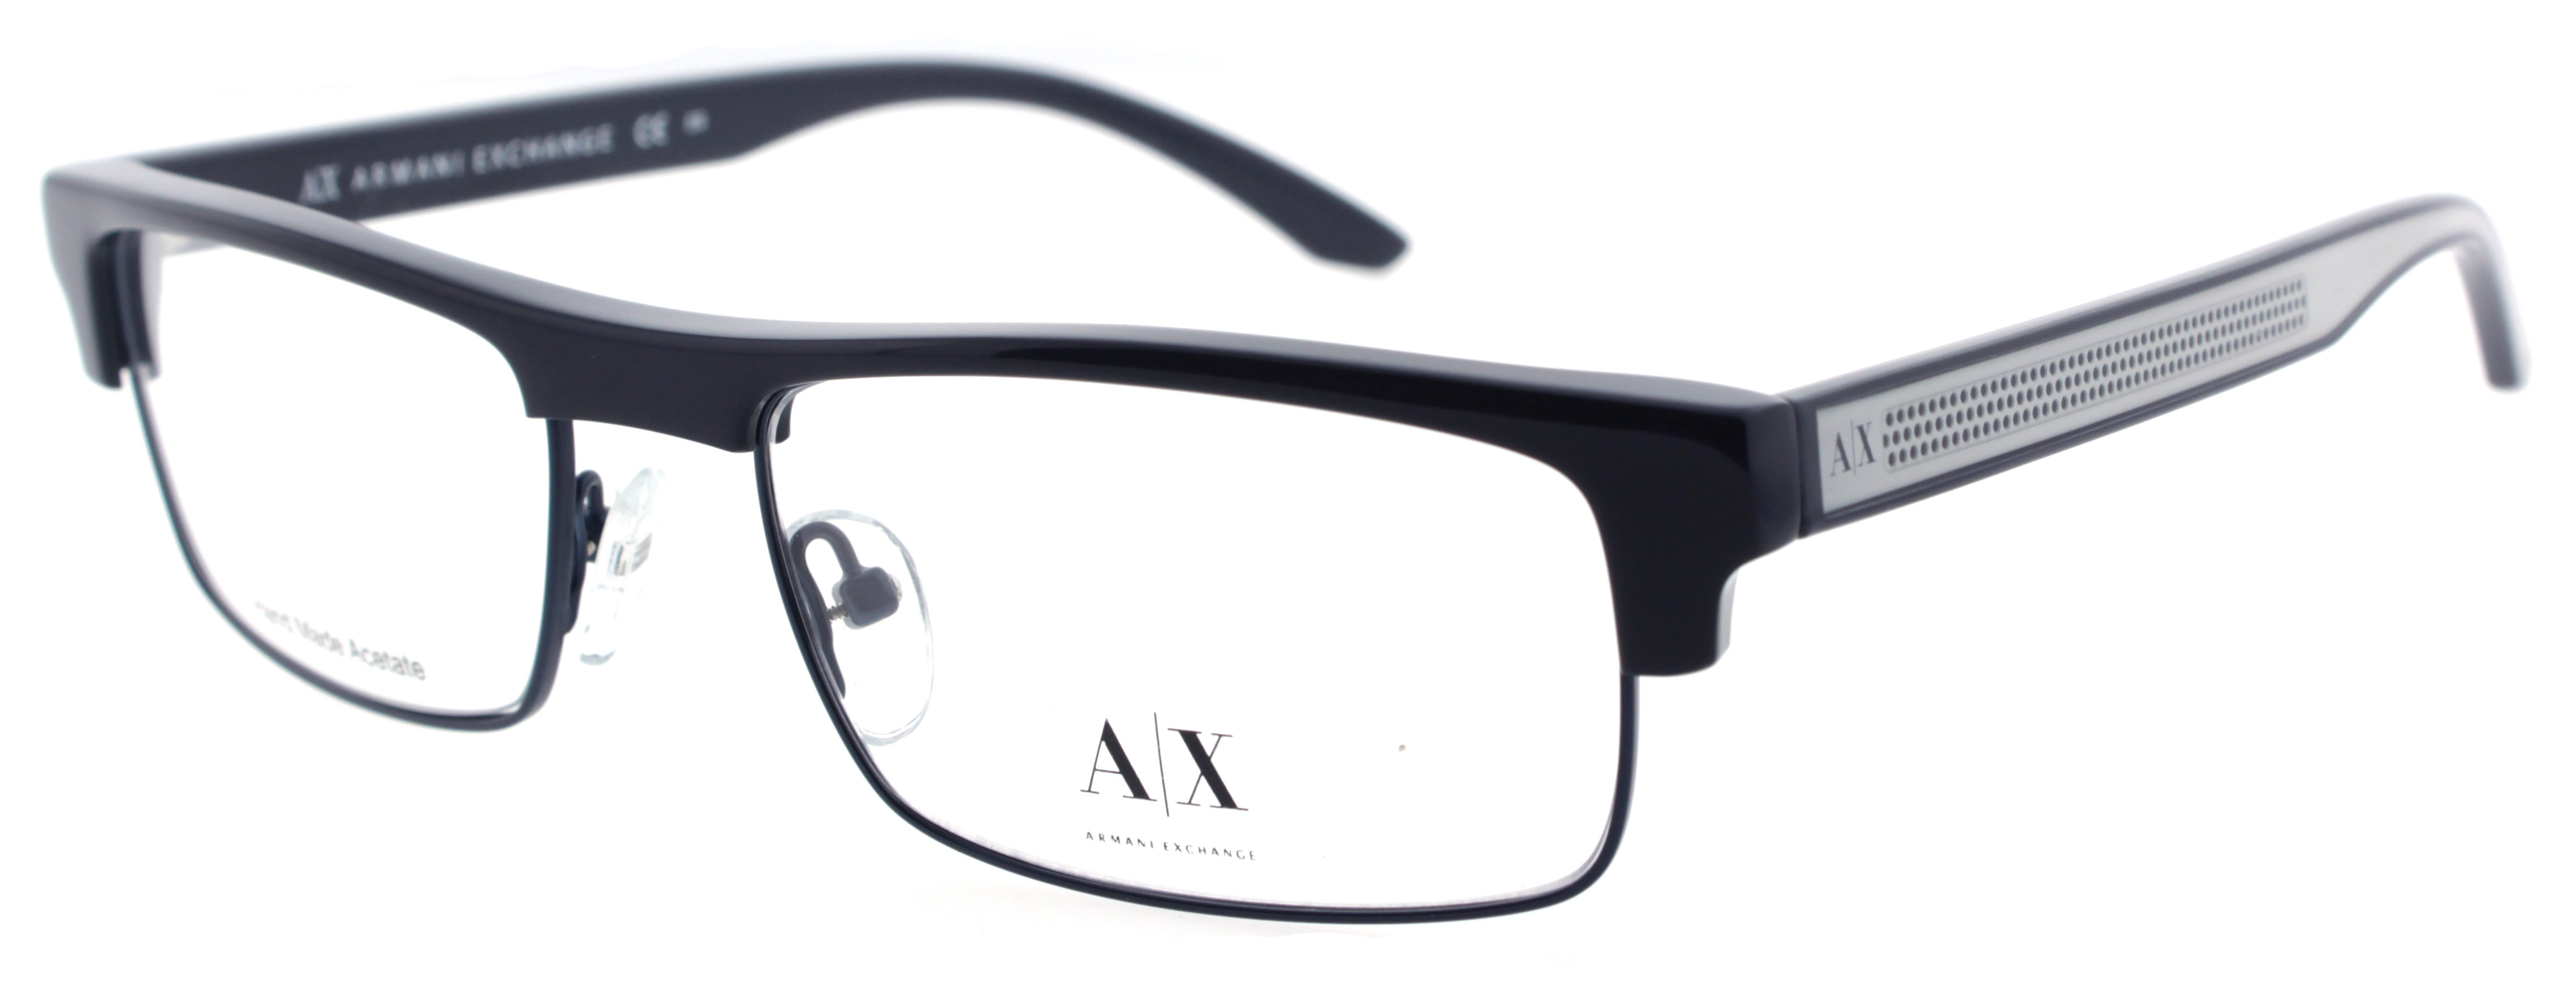 Armani Glasses Frames White : Armani Exchange AX 157 GN4 Blue White AX157 Full Frame ...